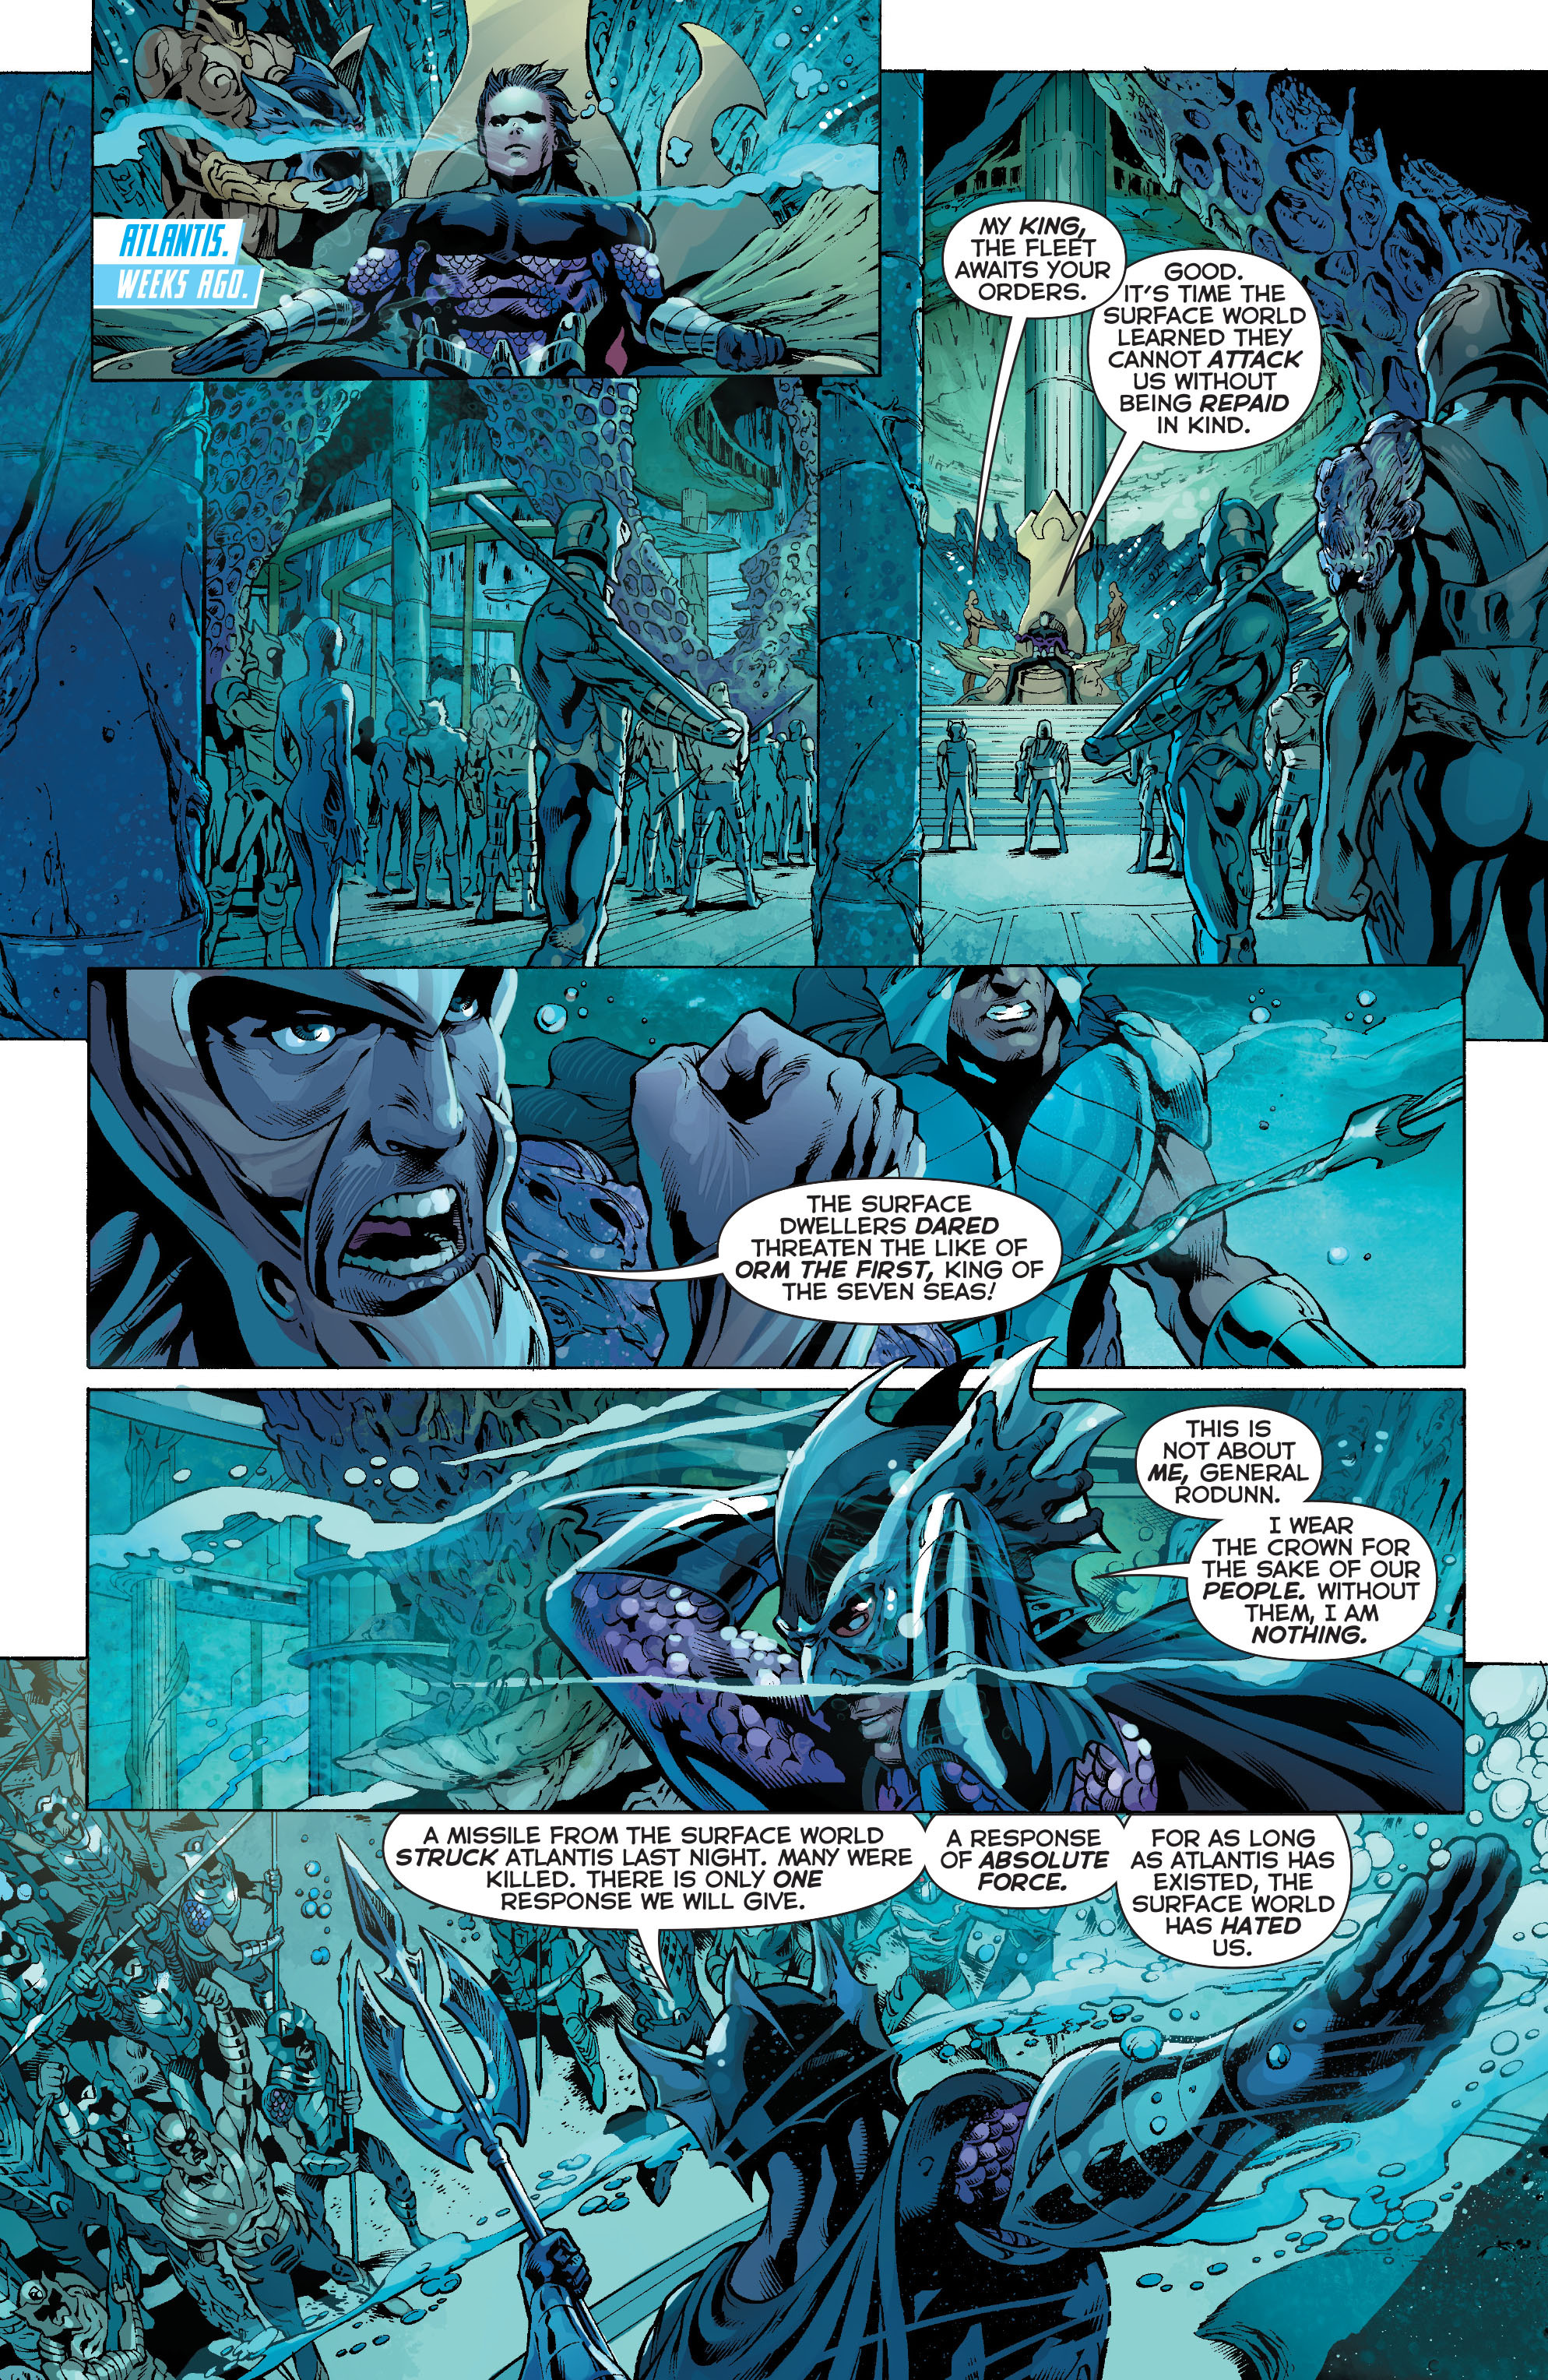 Read online Aquaman (2011) comic -  Issue #23.2 - 2